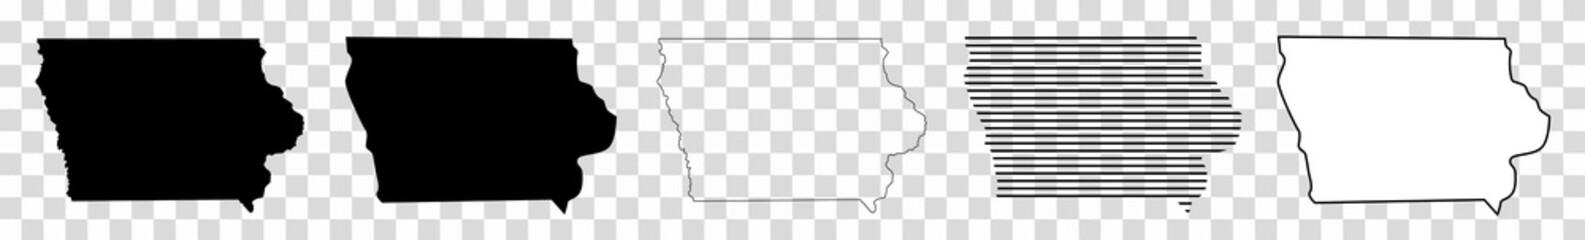 Iowa Map Black | State Border | United States | US America | Transparent Isolated | Variations